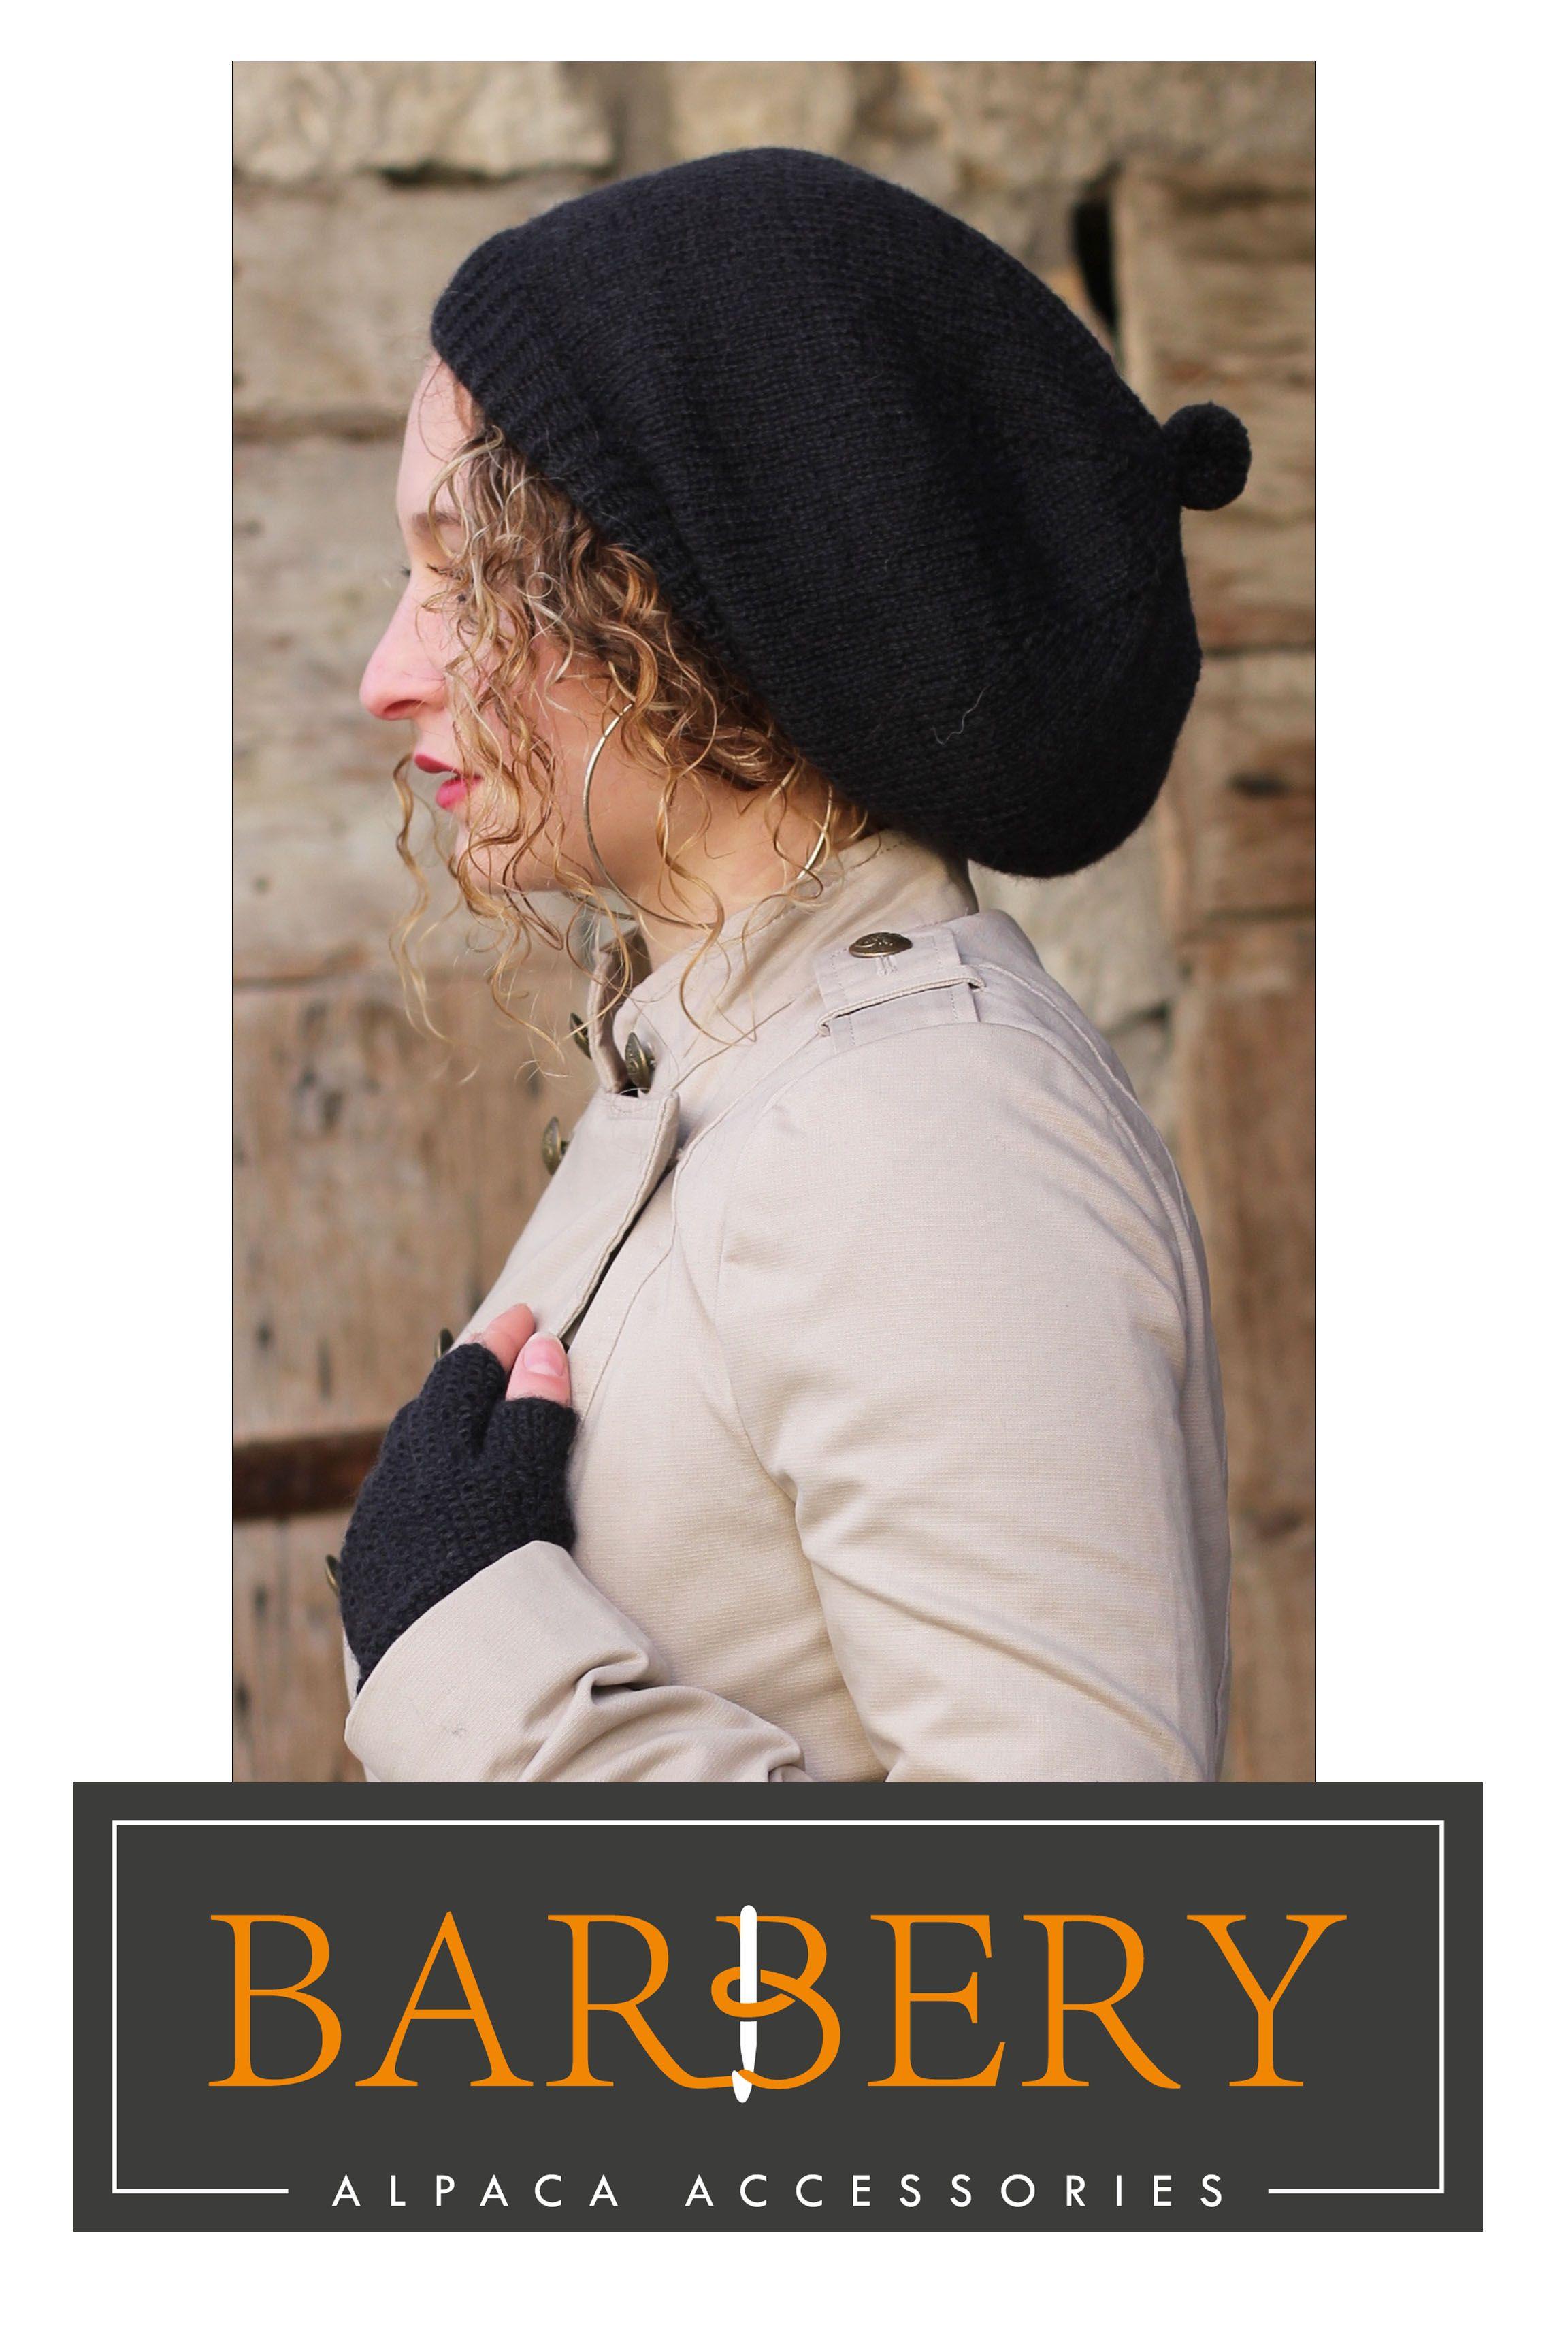 http://www.amazon.com/Handmade-Alpaca-Rasta-Fingerless-Gloves/dp/B009QN6TNE/ref=sr_1_1?s=apparel&ie=UTF8&qid=1422563823&sr=1-1&keywords=patricia+avenue+dark+charcoal